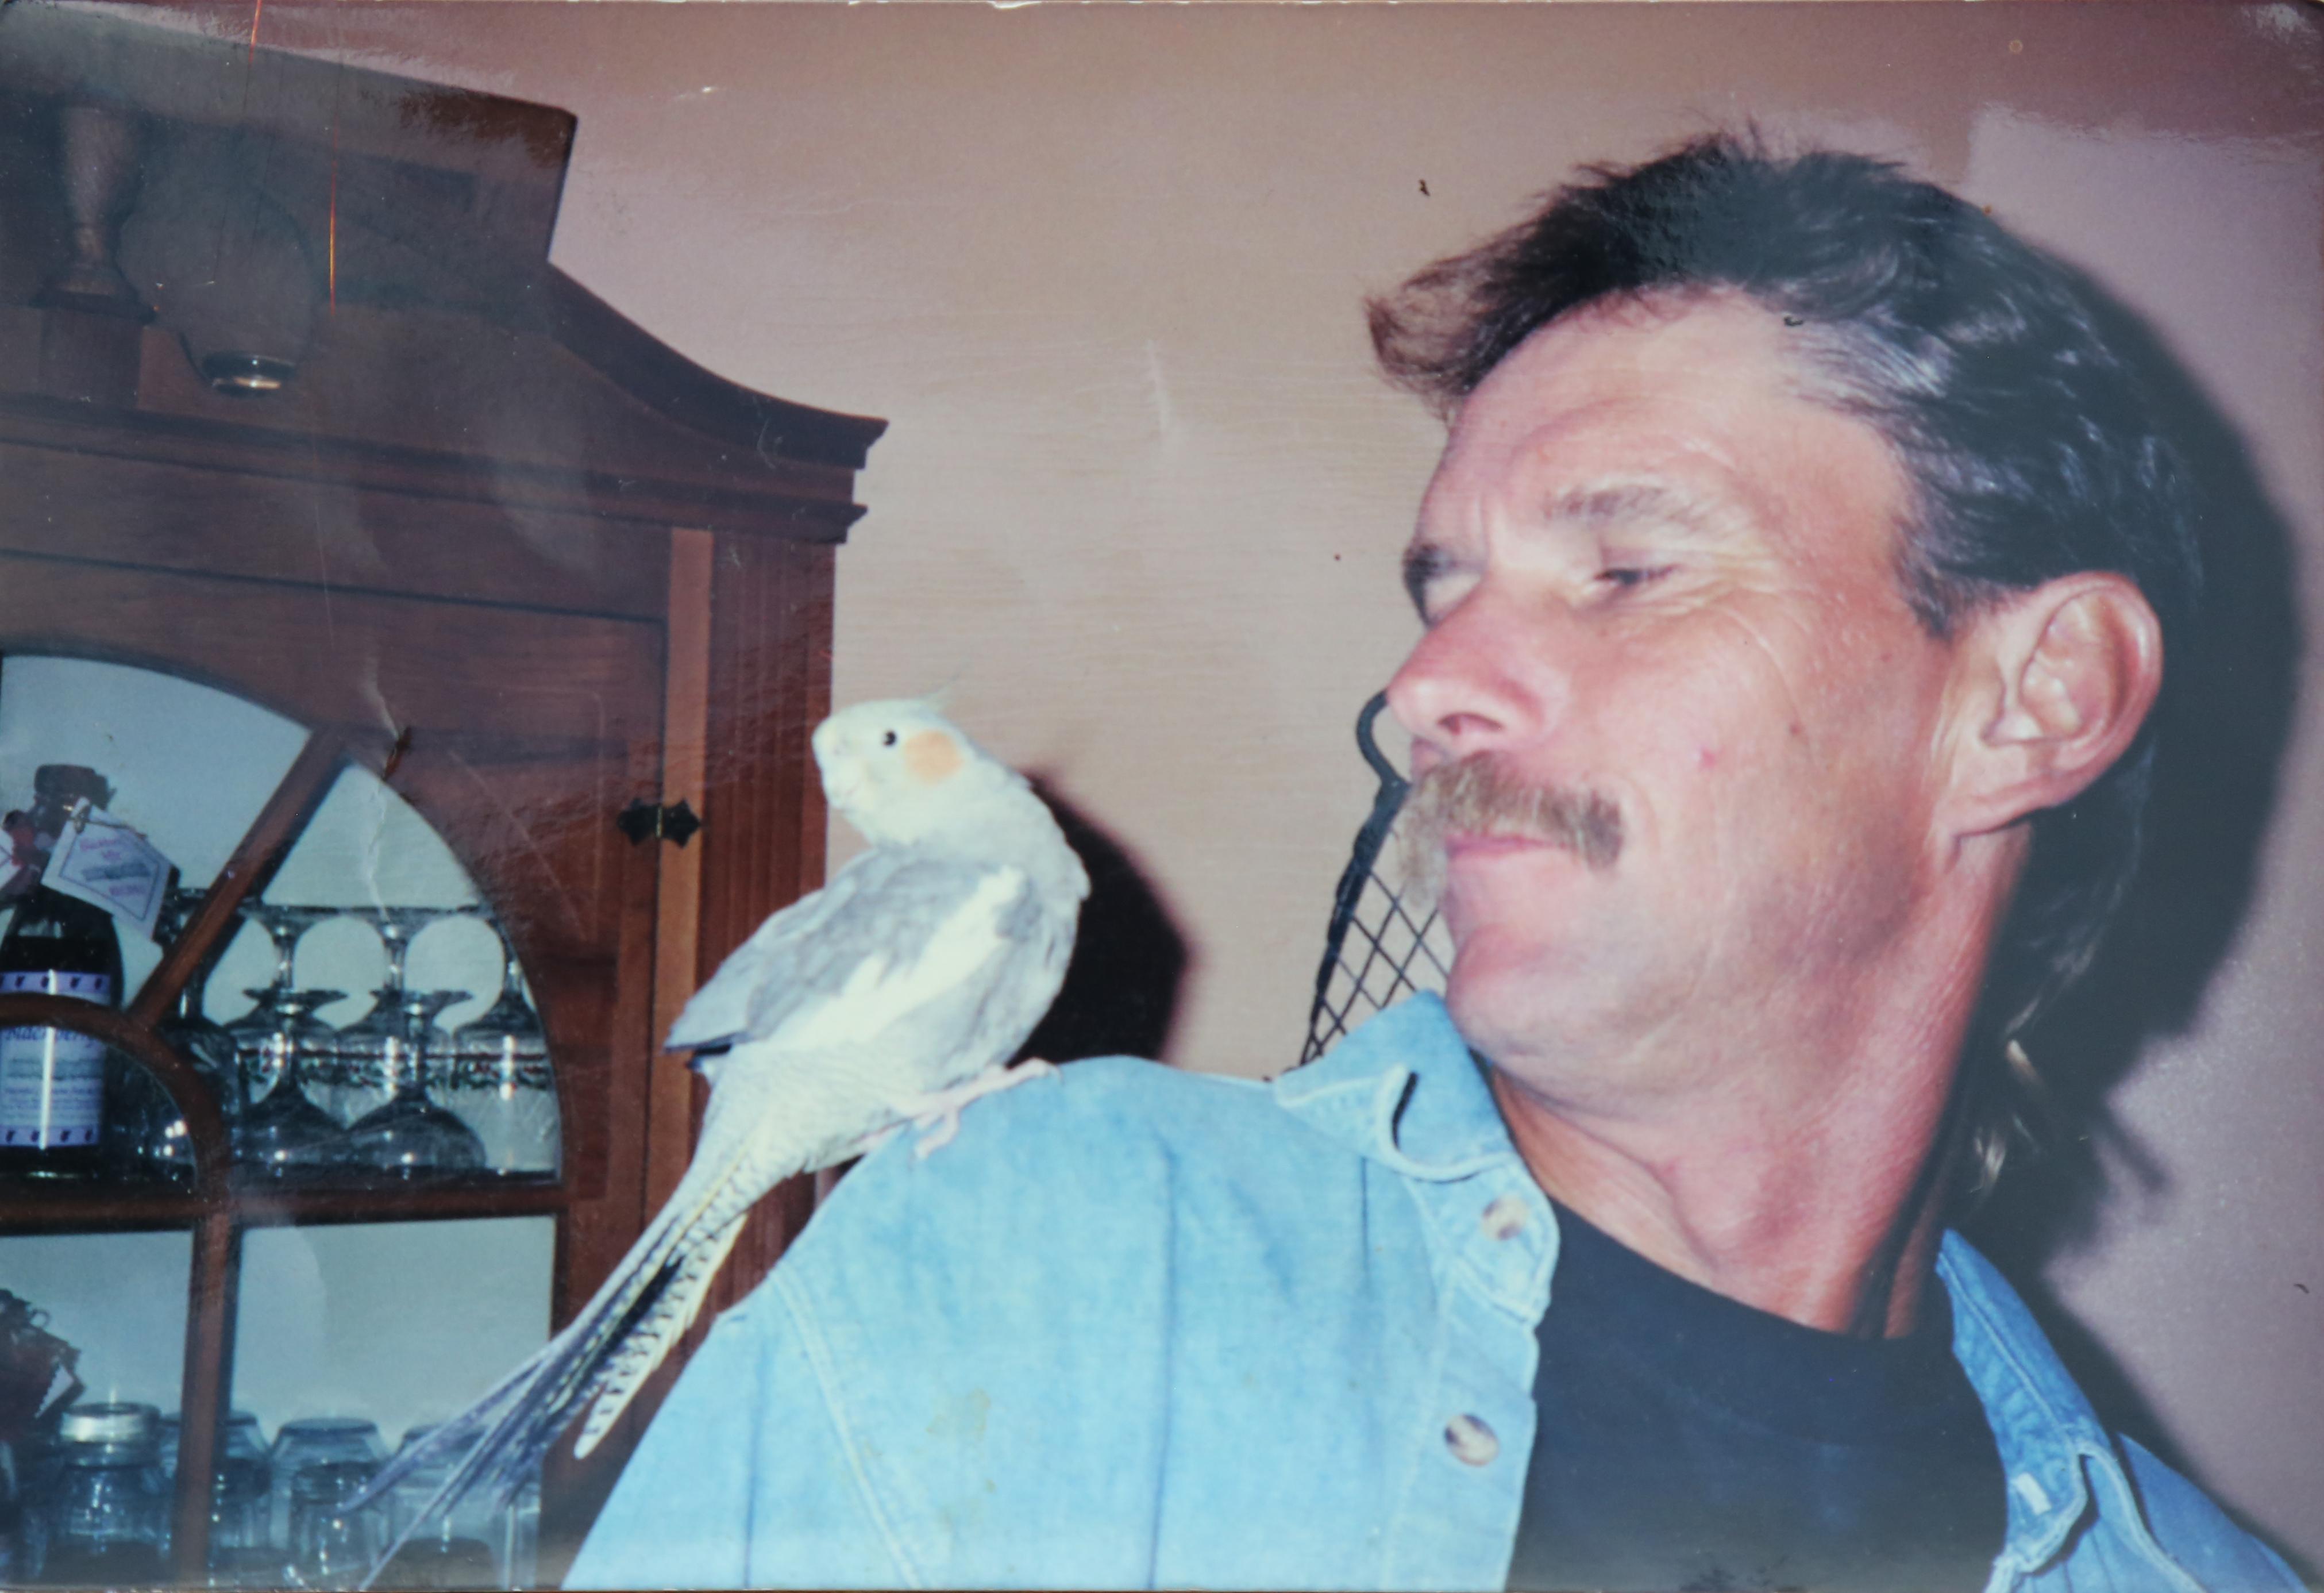 Dennis Perry's pet cockatiel was named Squeaky.